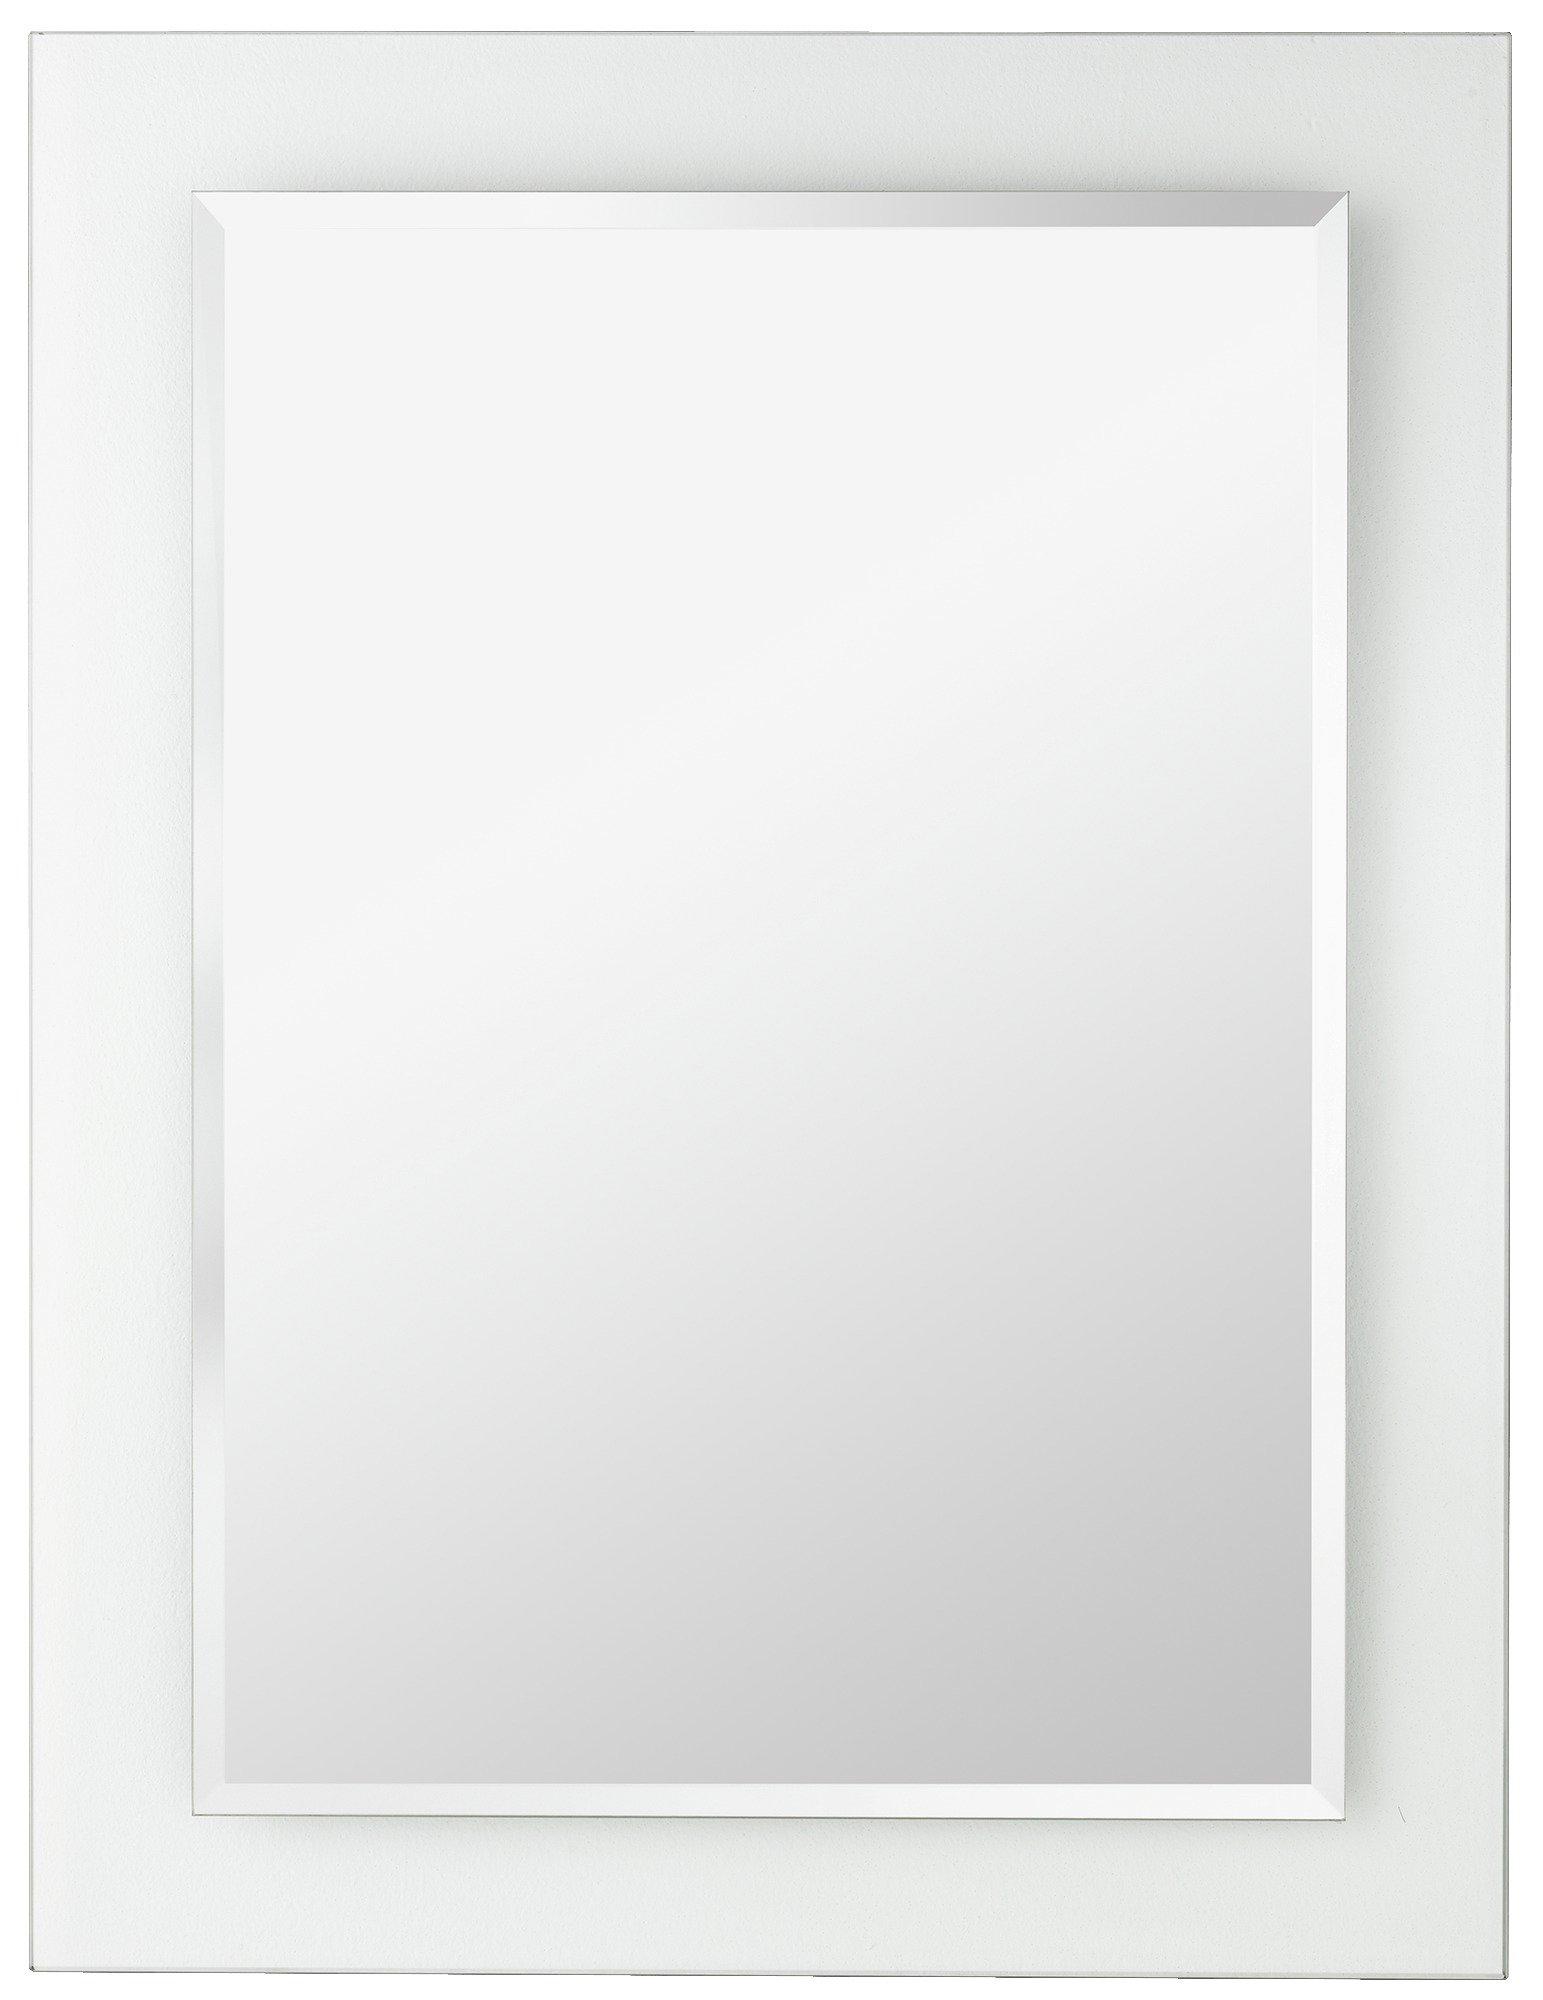 Bathroom Mirror Uk buy home rectangular clear border bathroom mirror at argos.co.uk